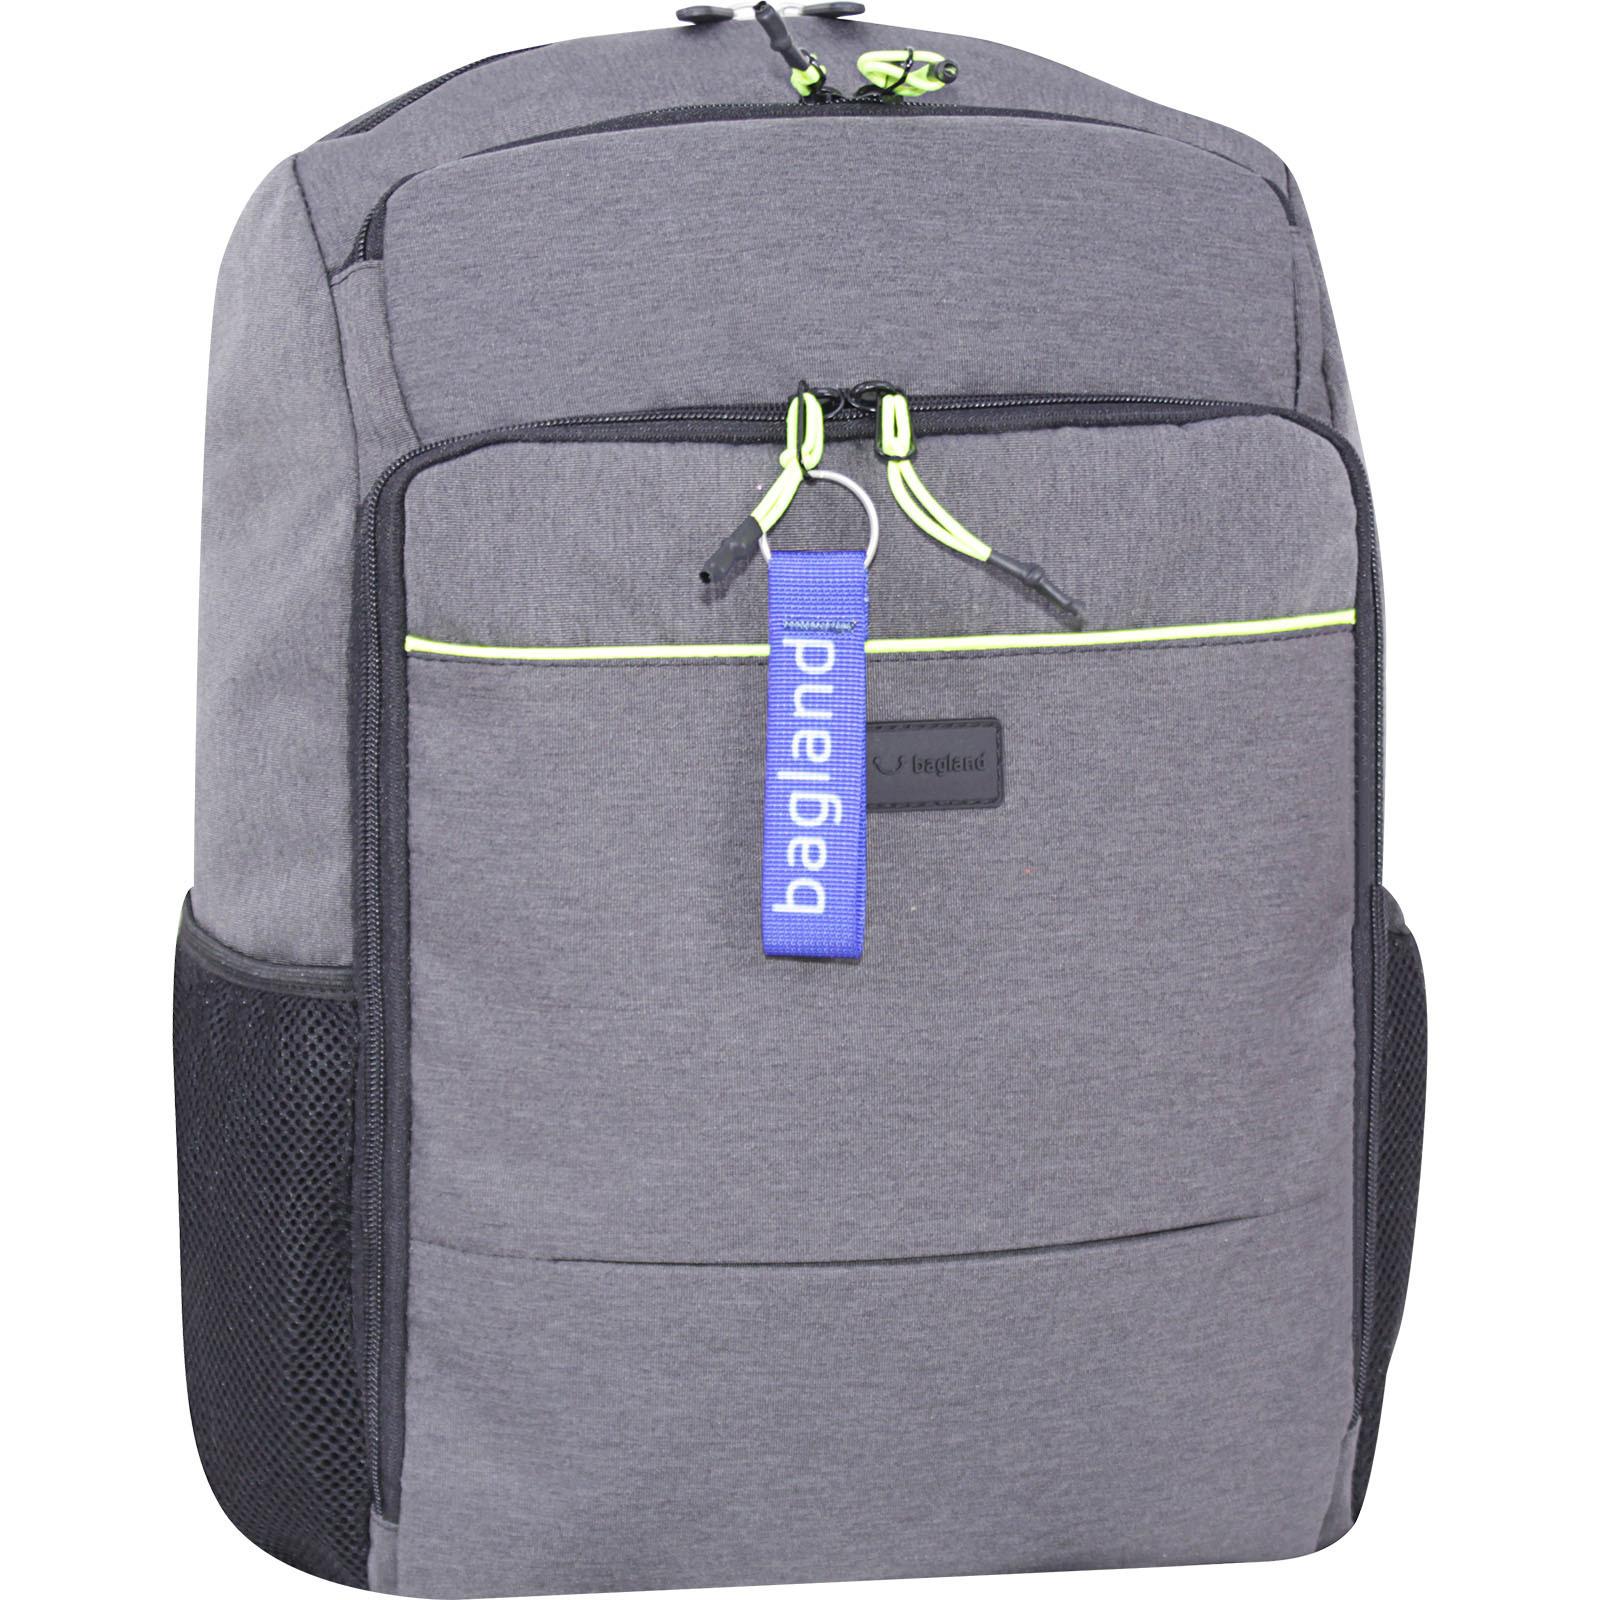 Мужские рюкзаки Рюкзак Bagland Дортмунд 30 л. Серый (0016769) IMG_7613-1600.jpg